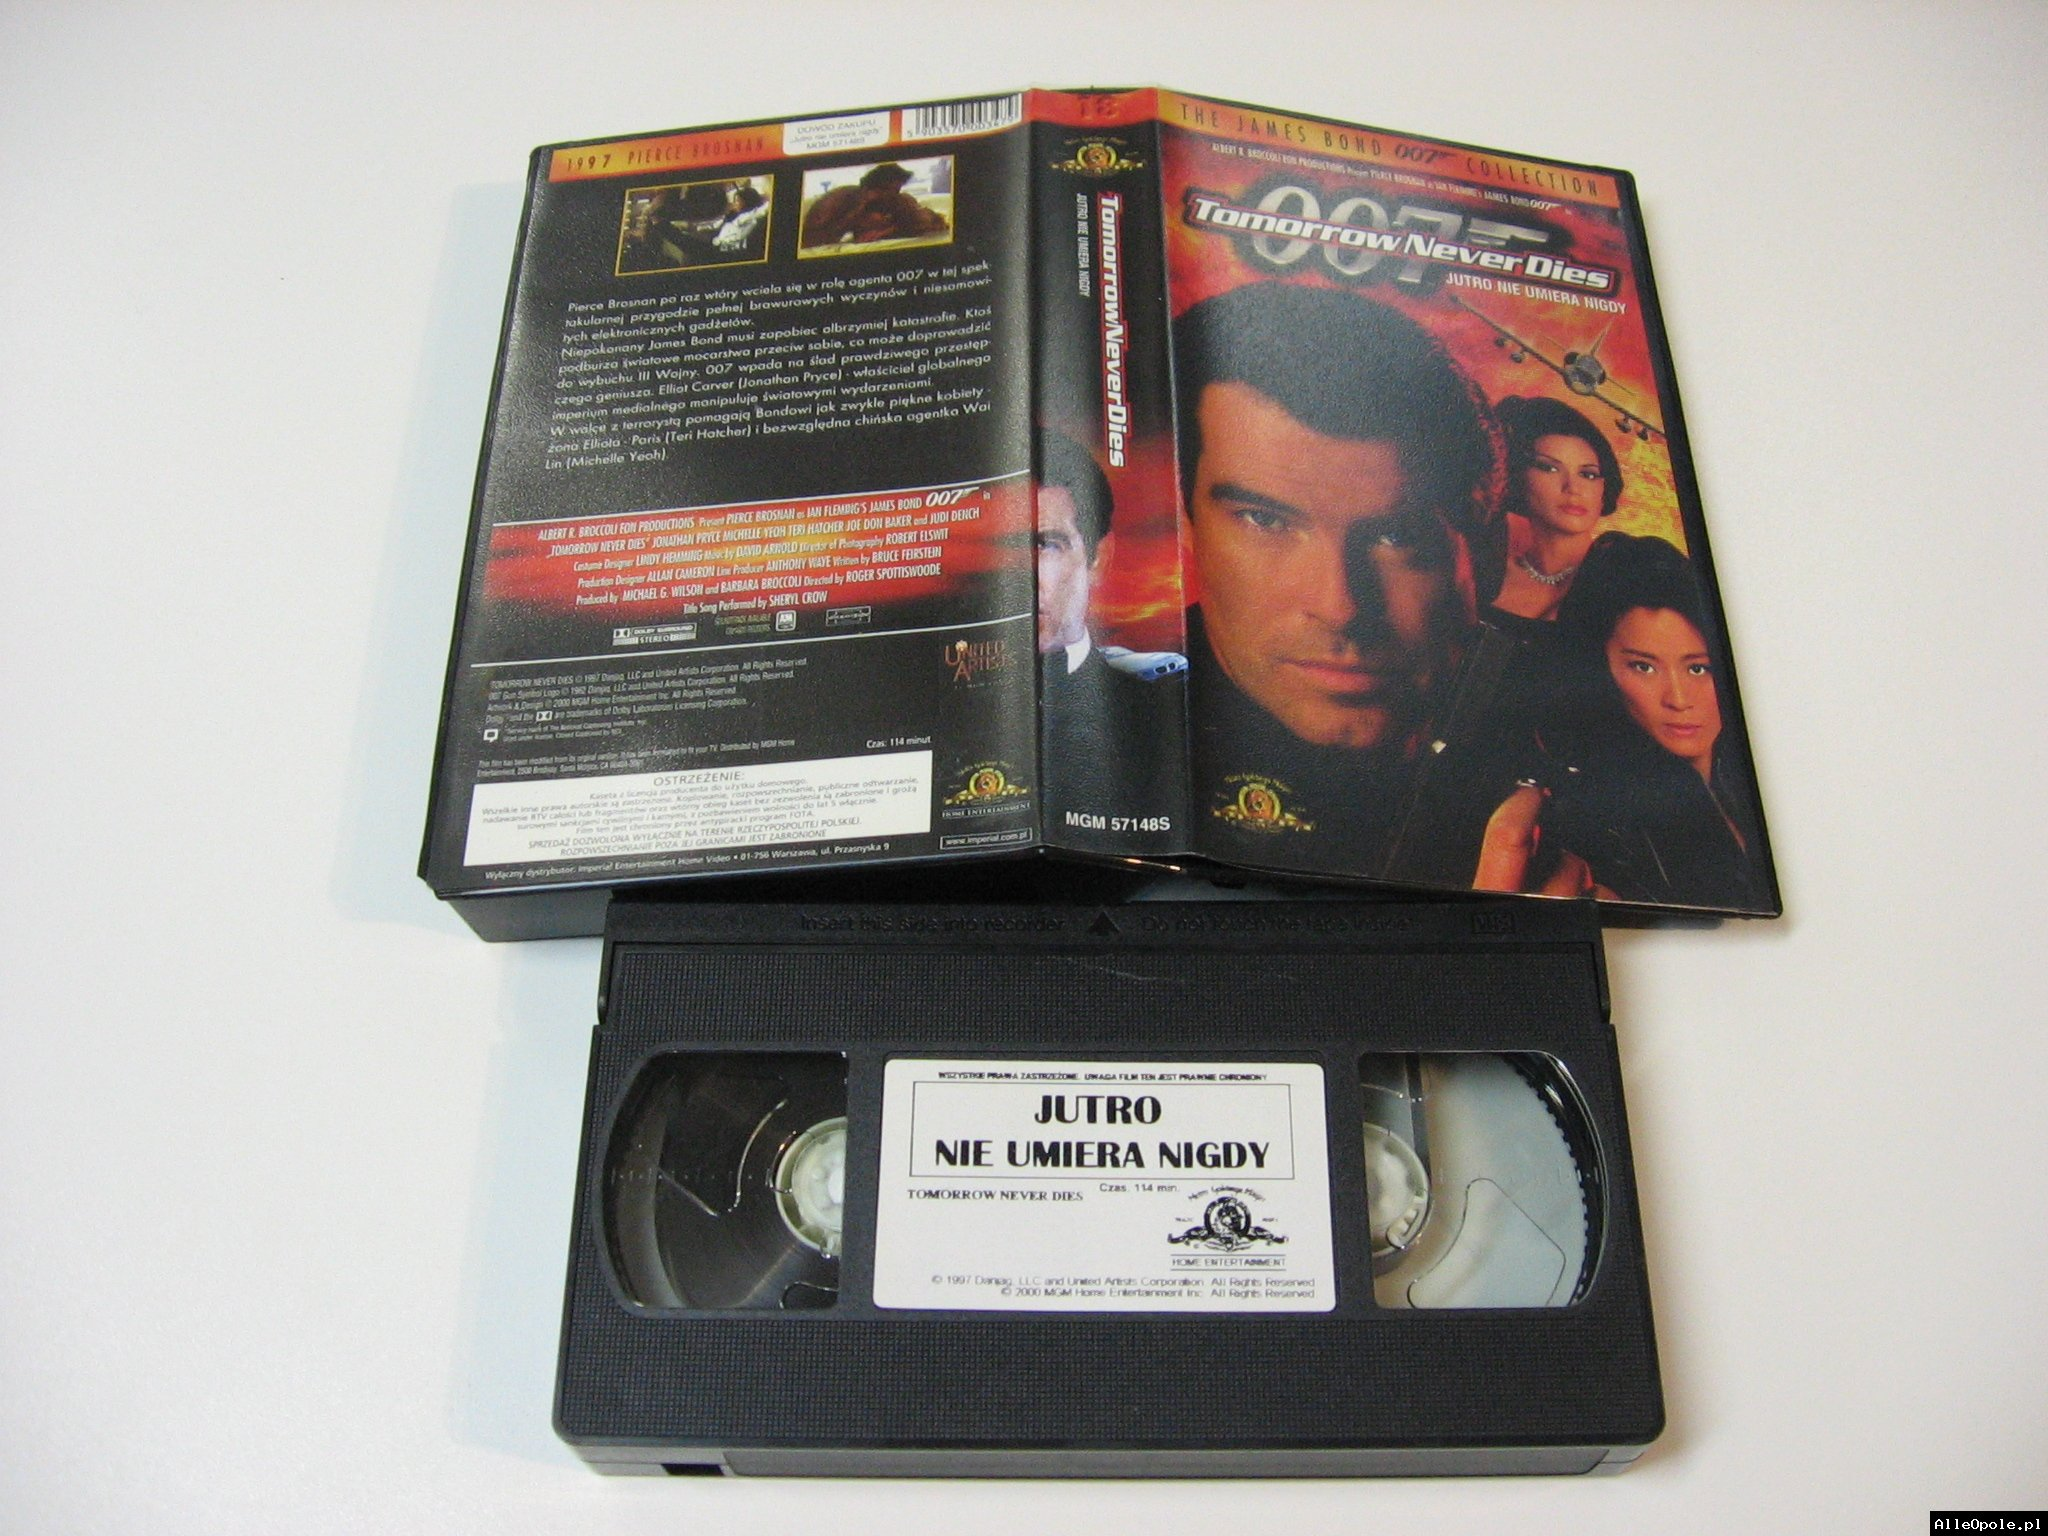 007 JUTRO NIE UMIERA NIGDY - VHS Kaseta Video - Opole 1730